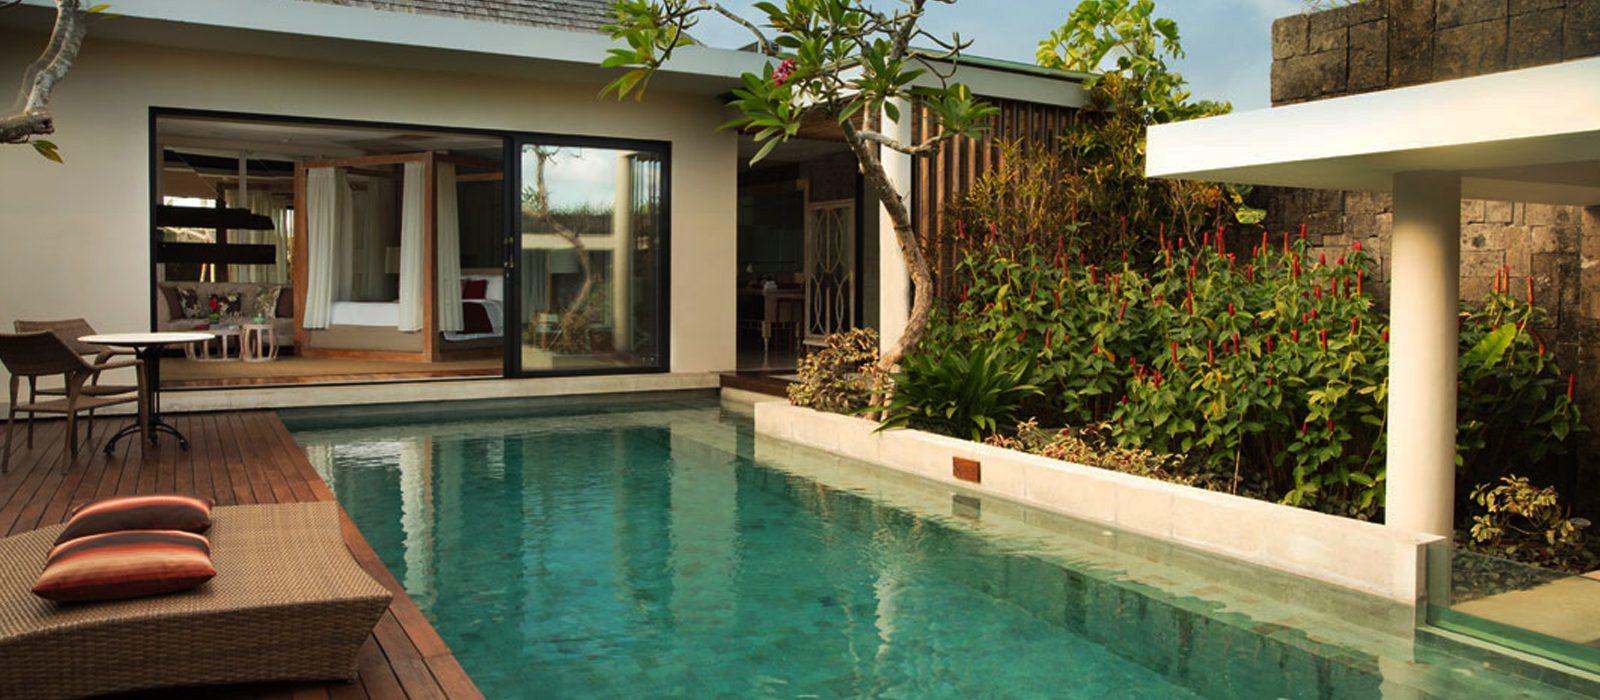 Berry Amour Romantic Villas Bali Holidays Pure Destinations